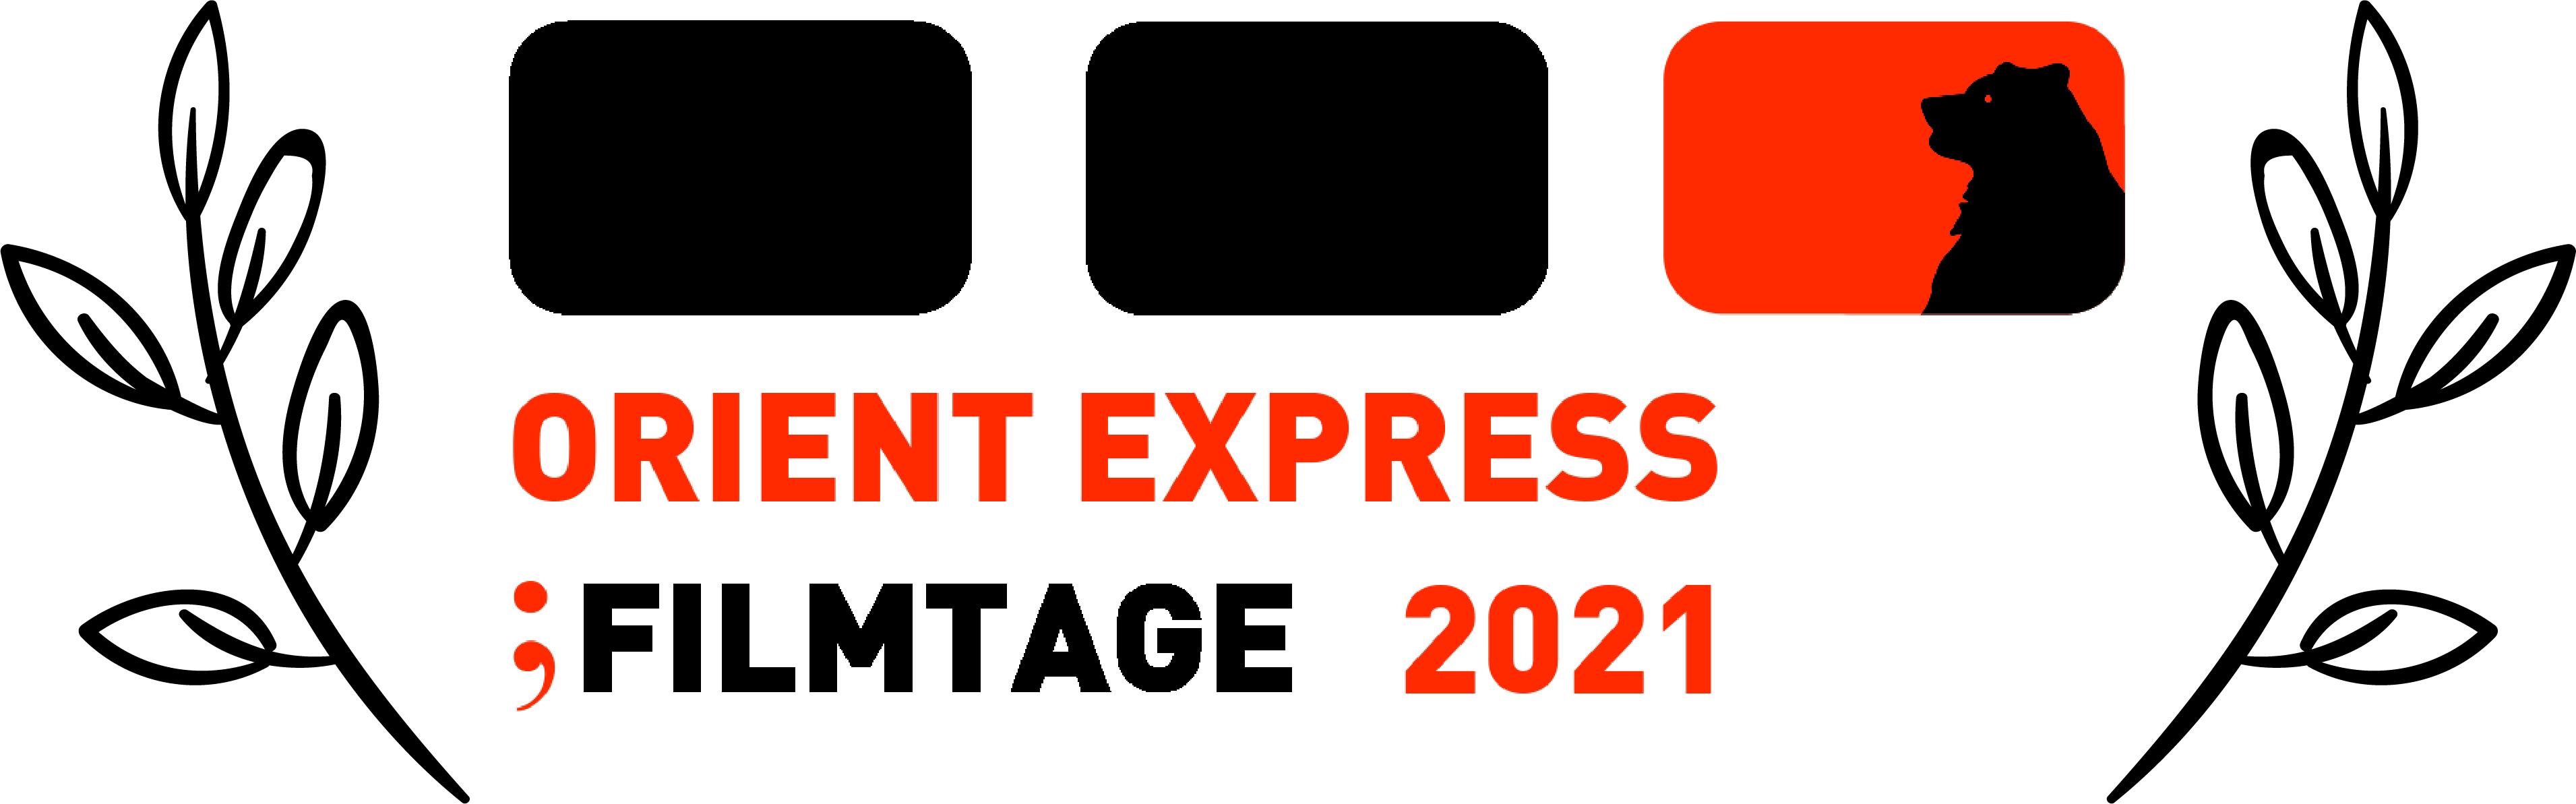 Orient Express Filmtage